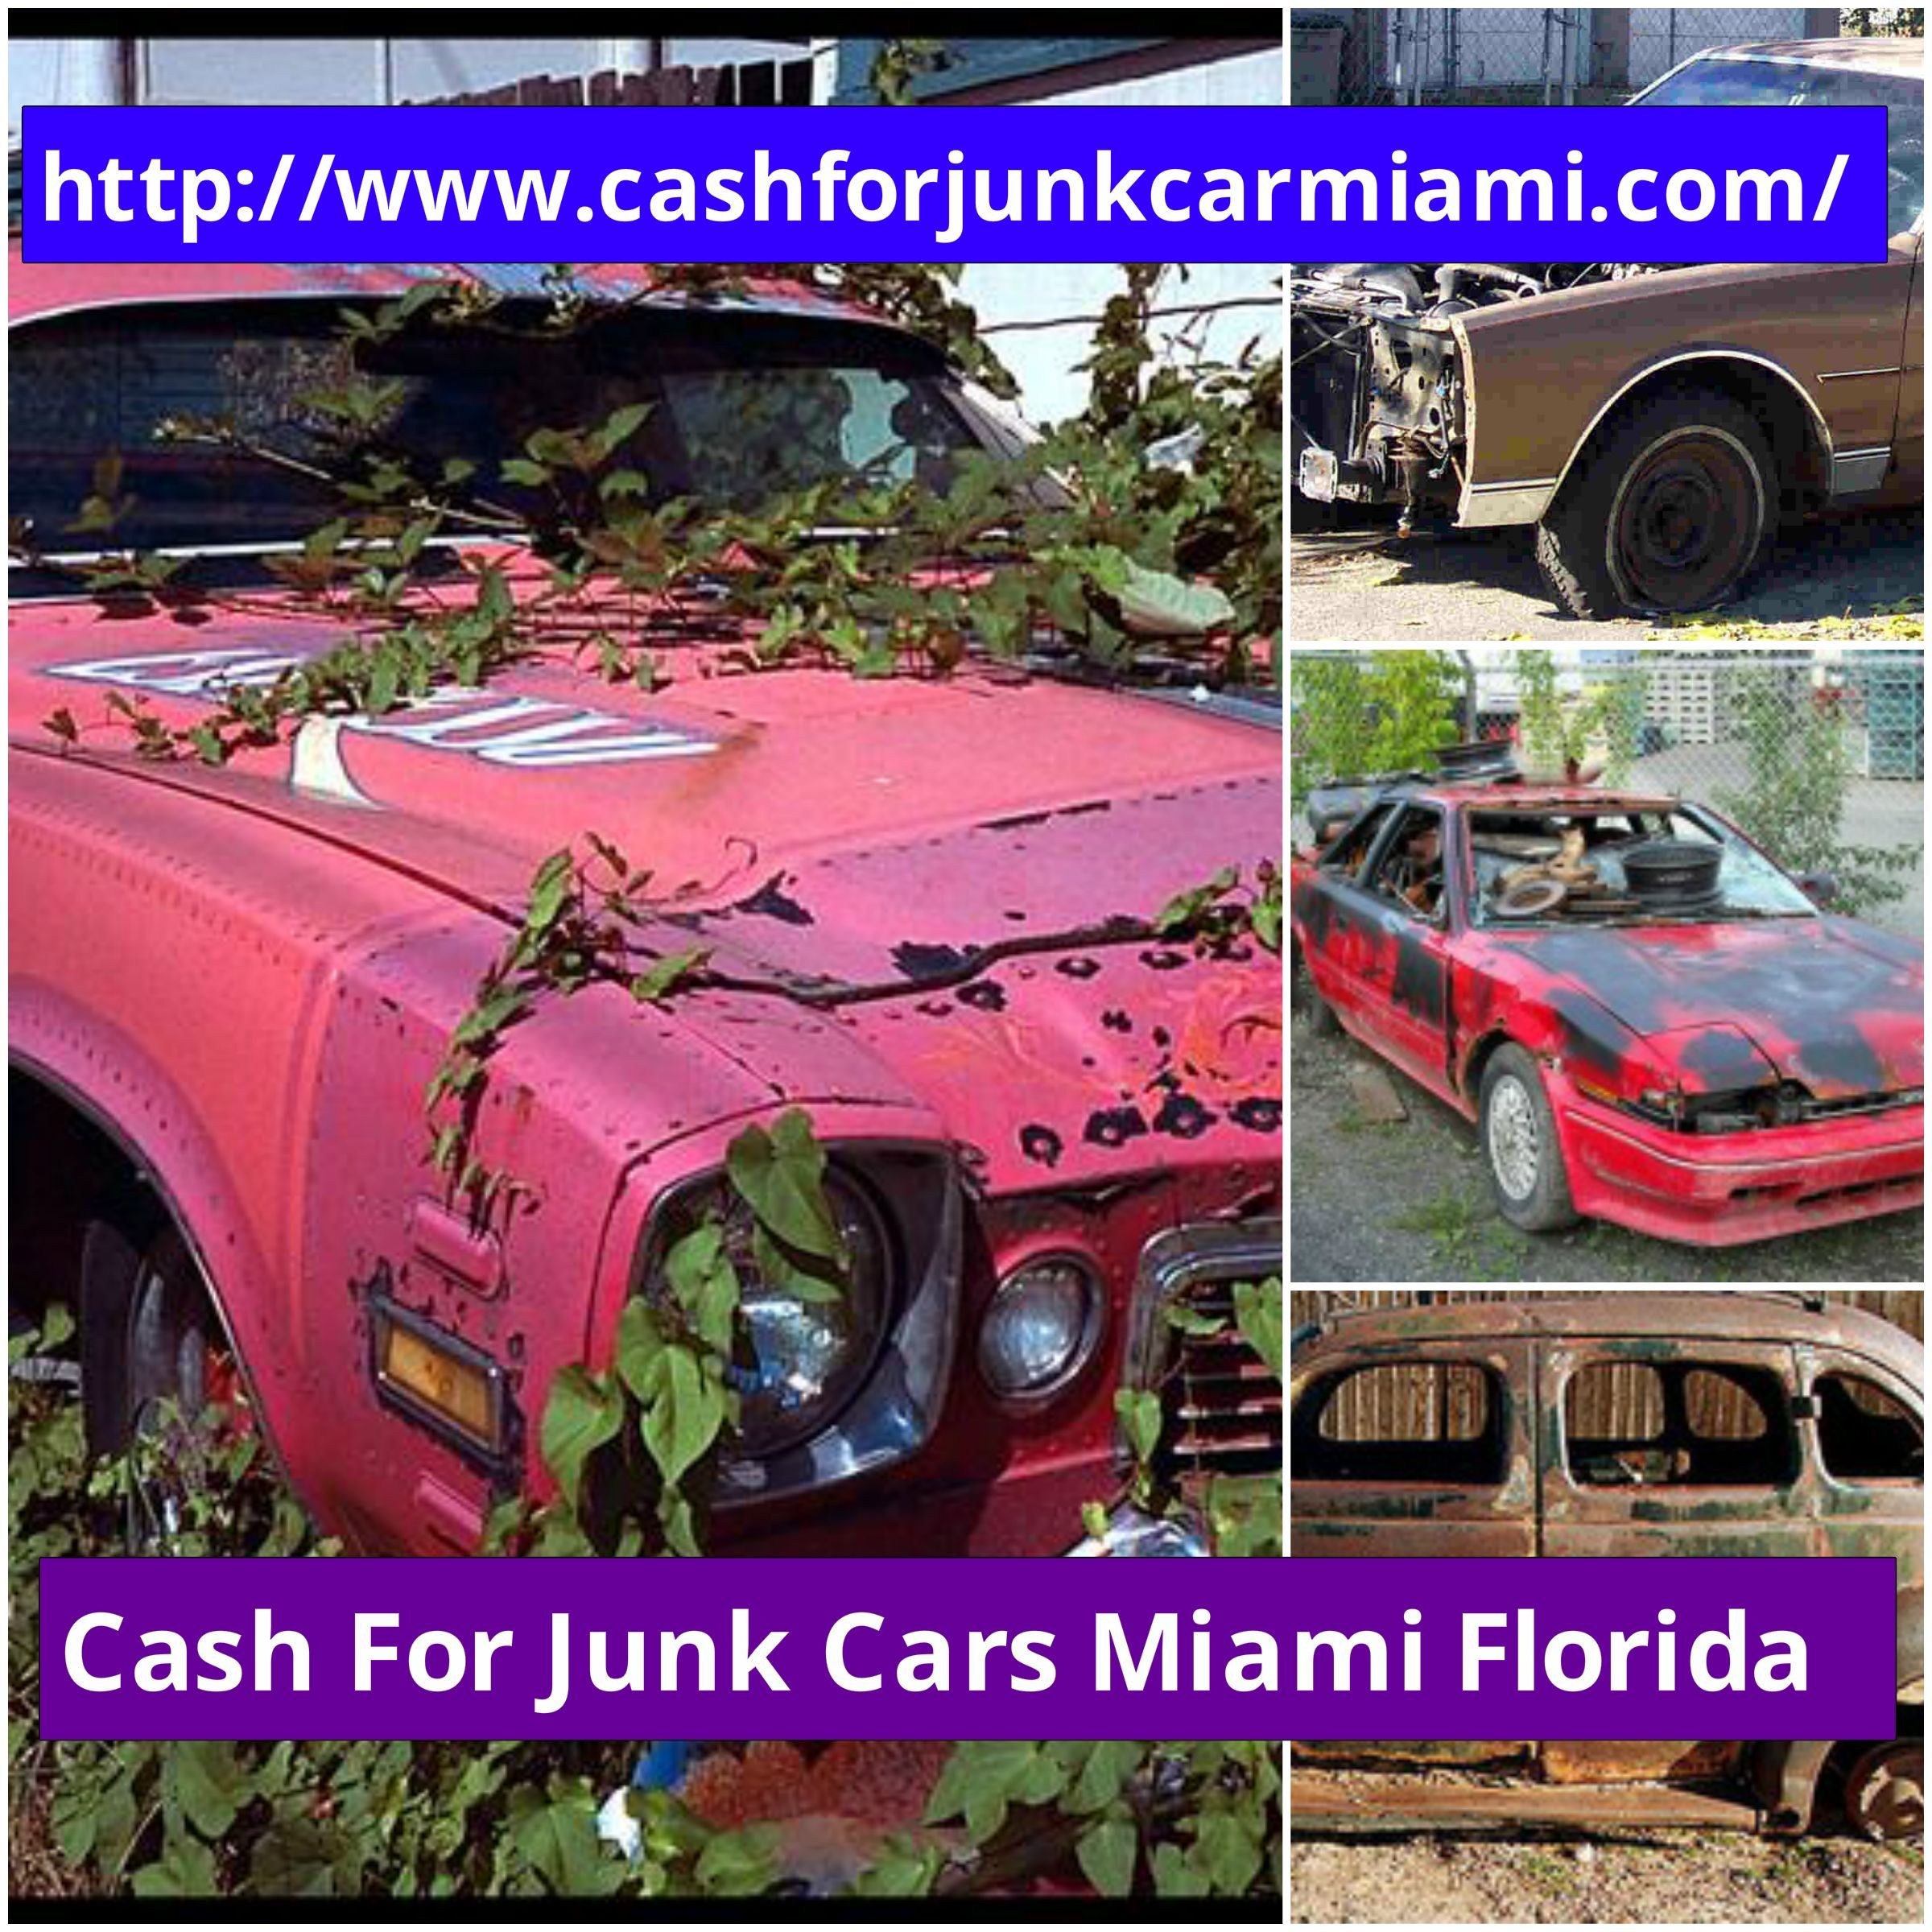 http://www.cashforjunkcarmiami.com/ Cash for junk cars Miami Florida ...